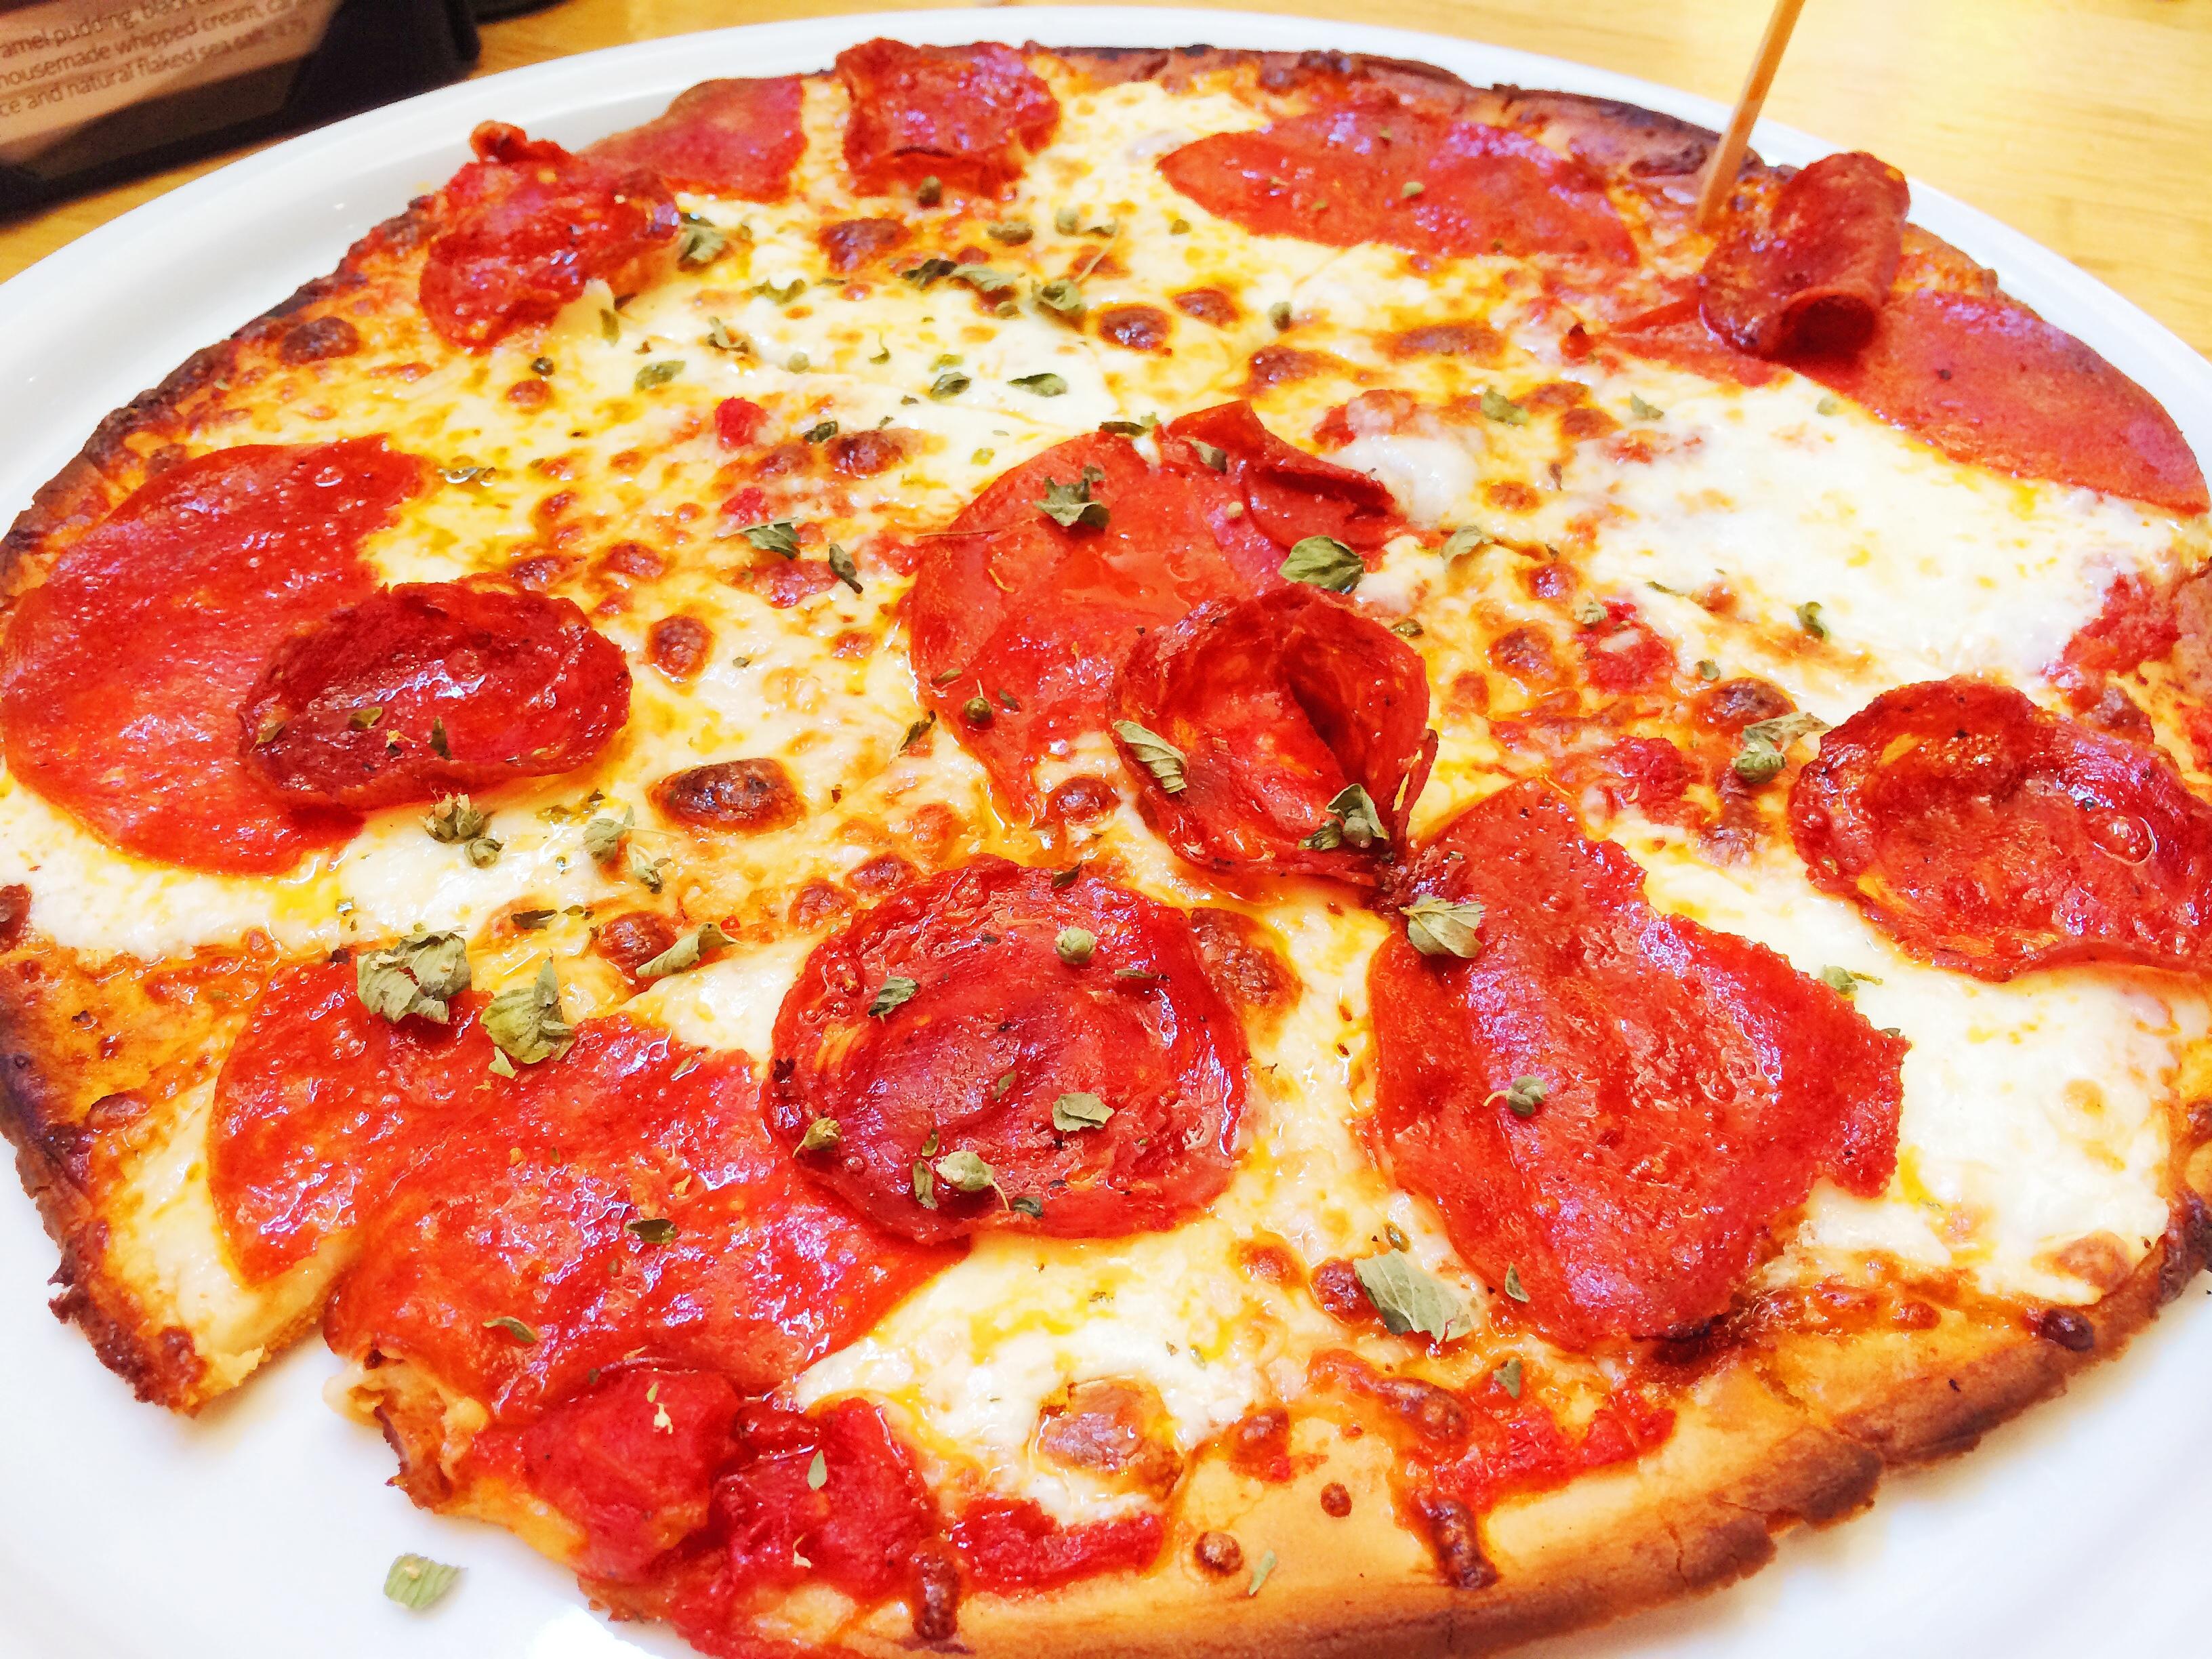 Gluten Free At California Pizza Kitchen Gluten Free Carolina Girl